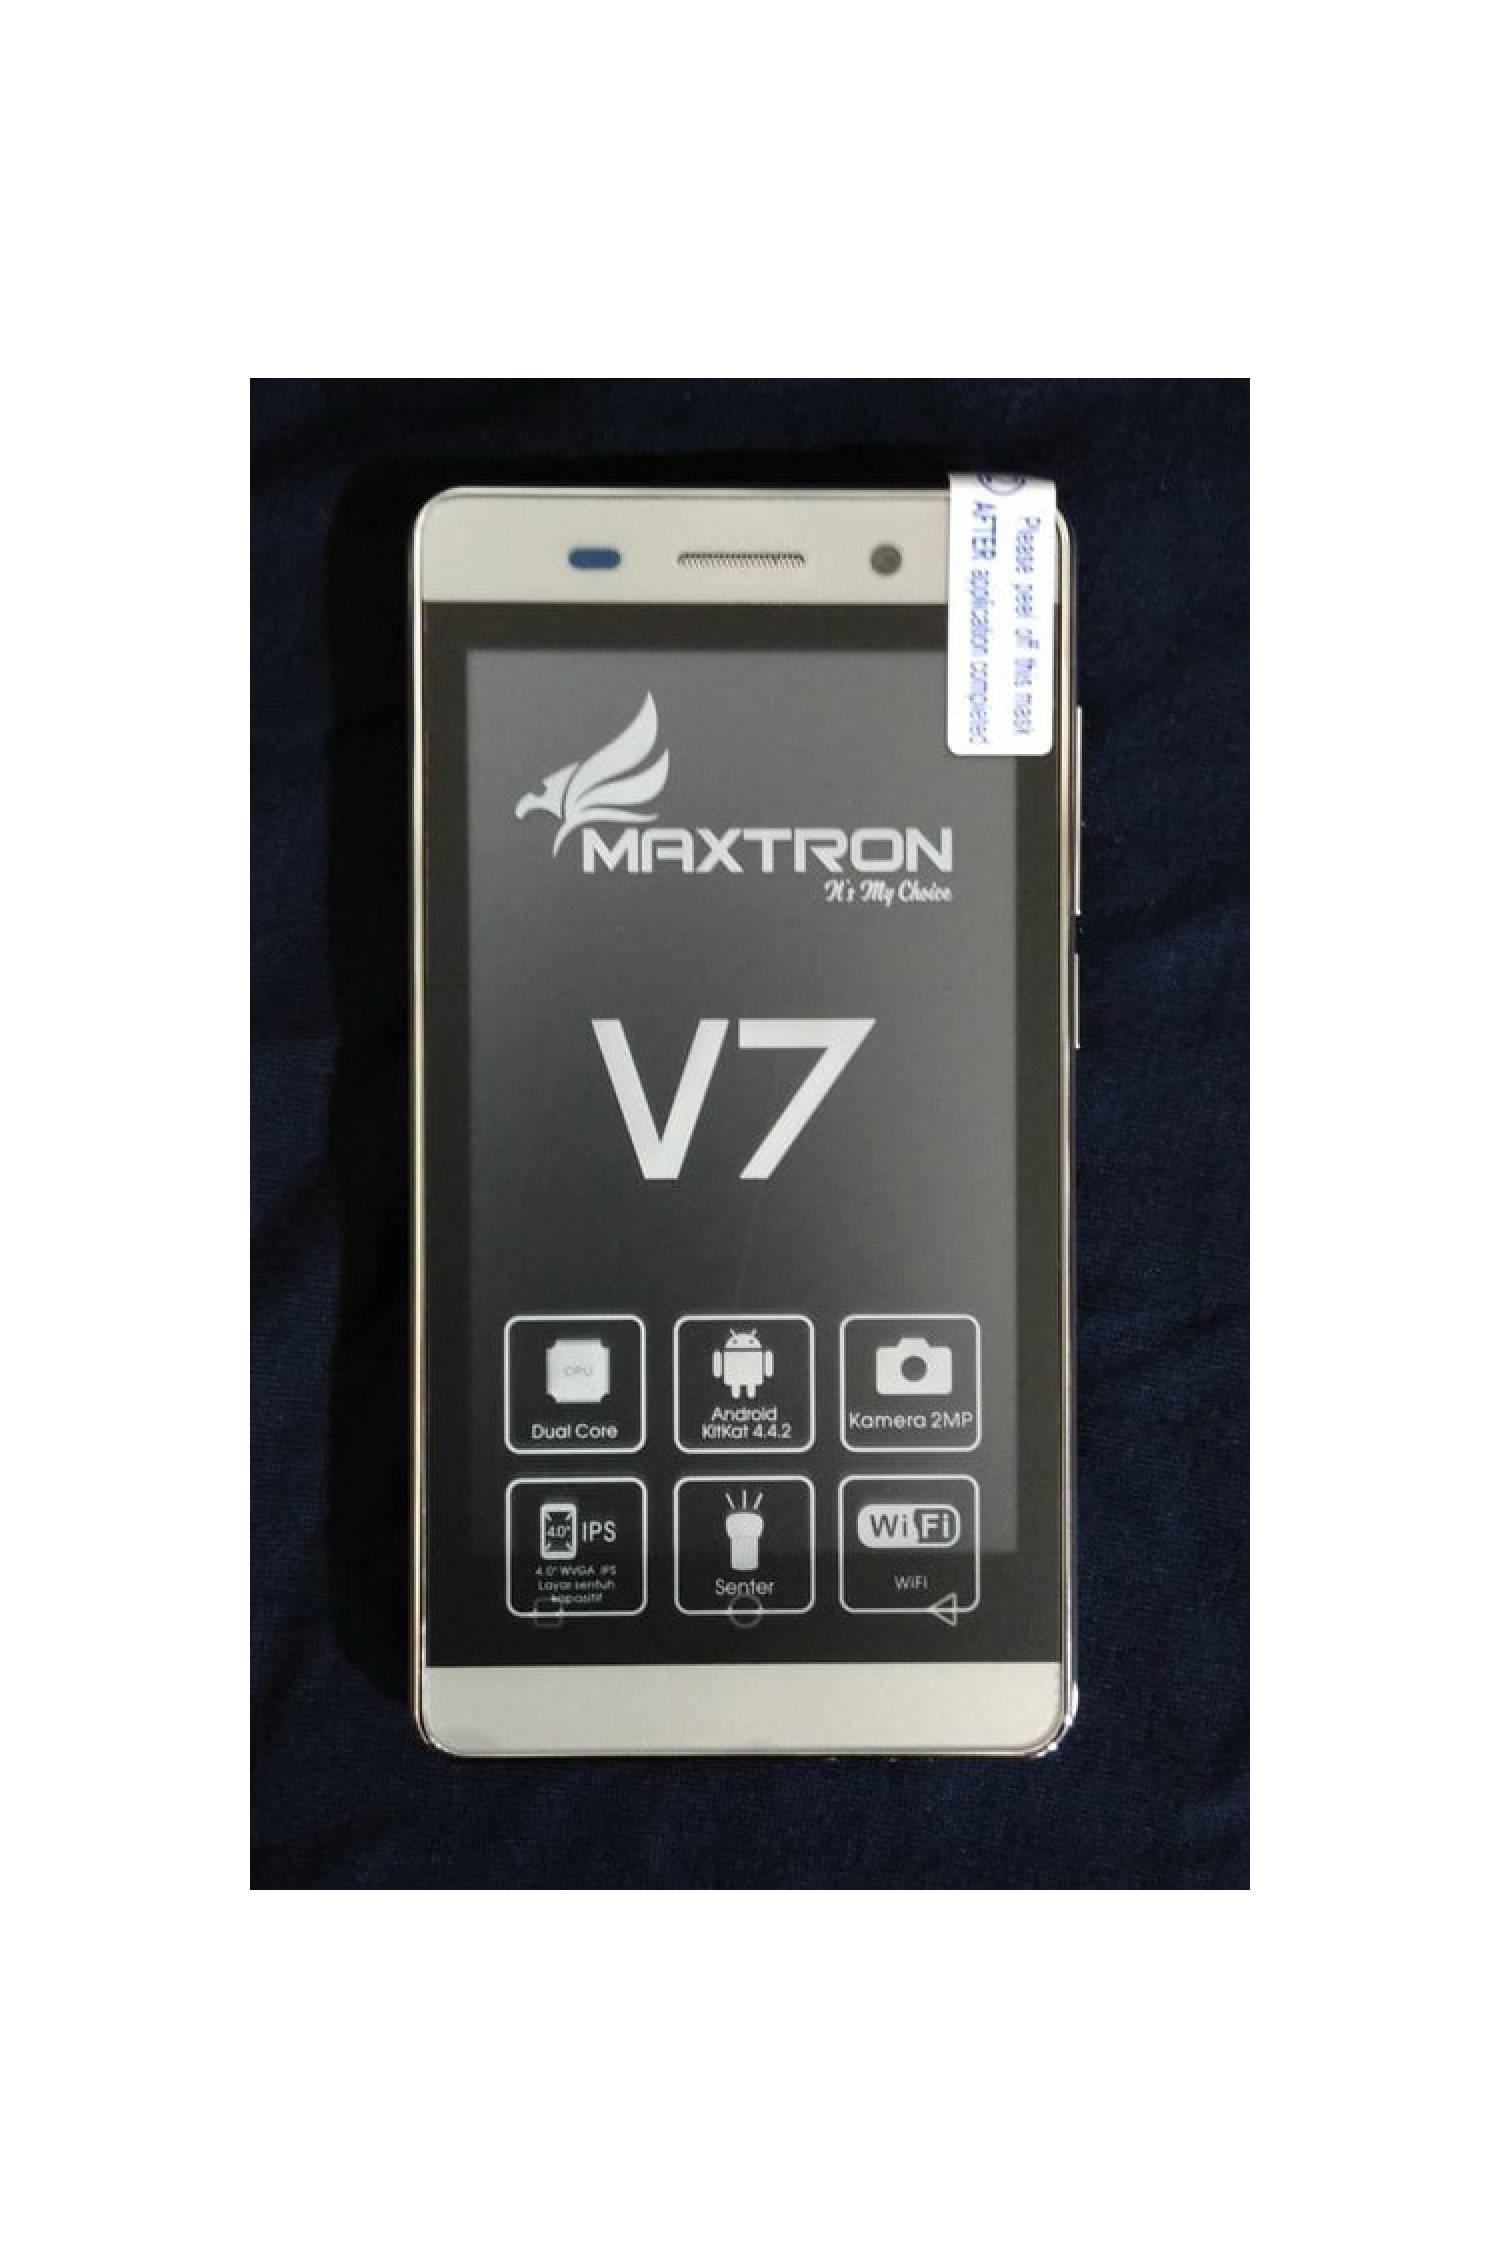 Jual Hp Maxtron New Murah Garansi Dan Berkualitas Id Store New8a Smartphone Rp 576000